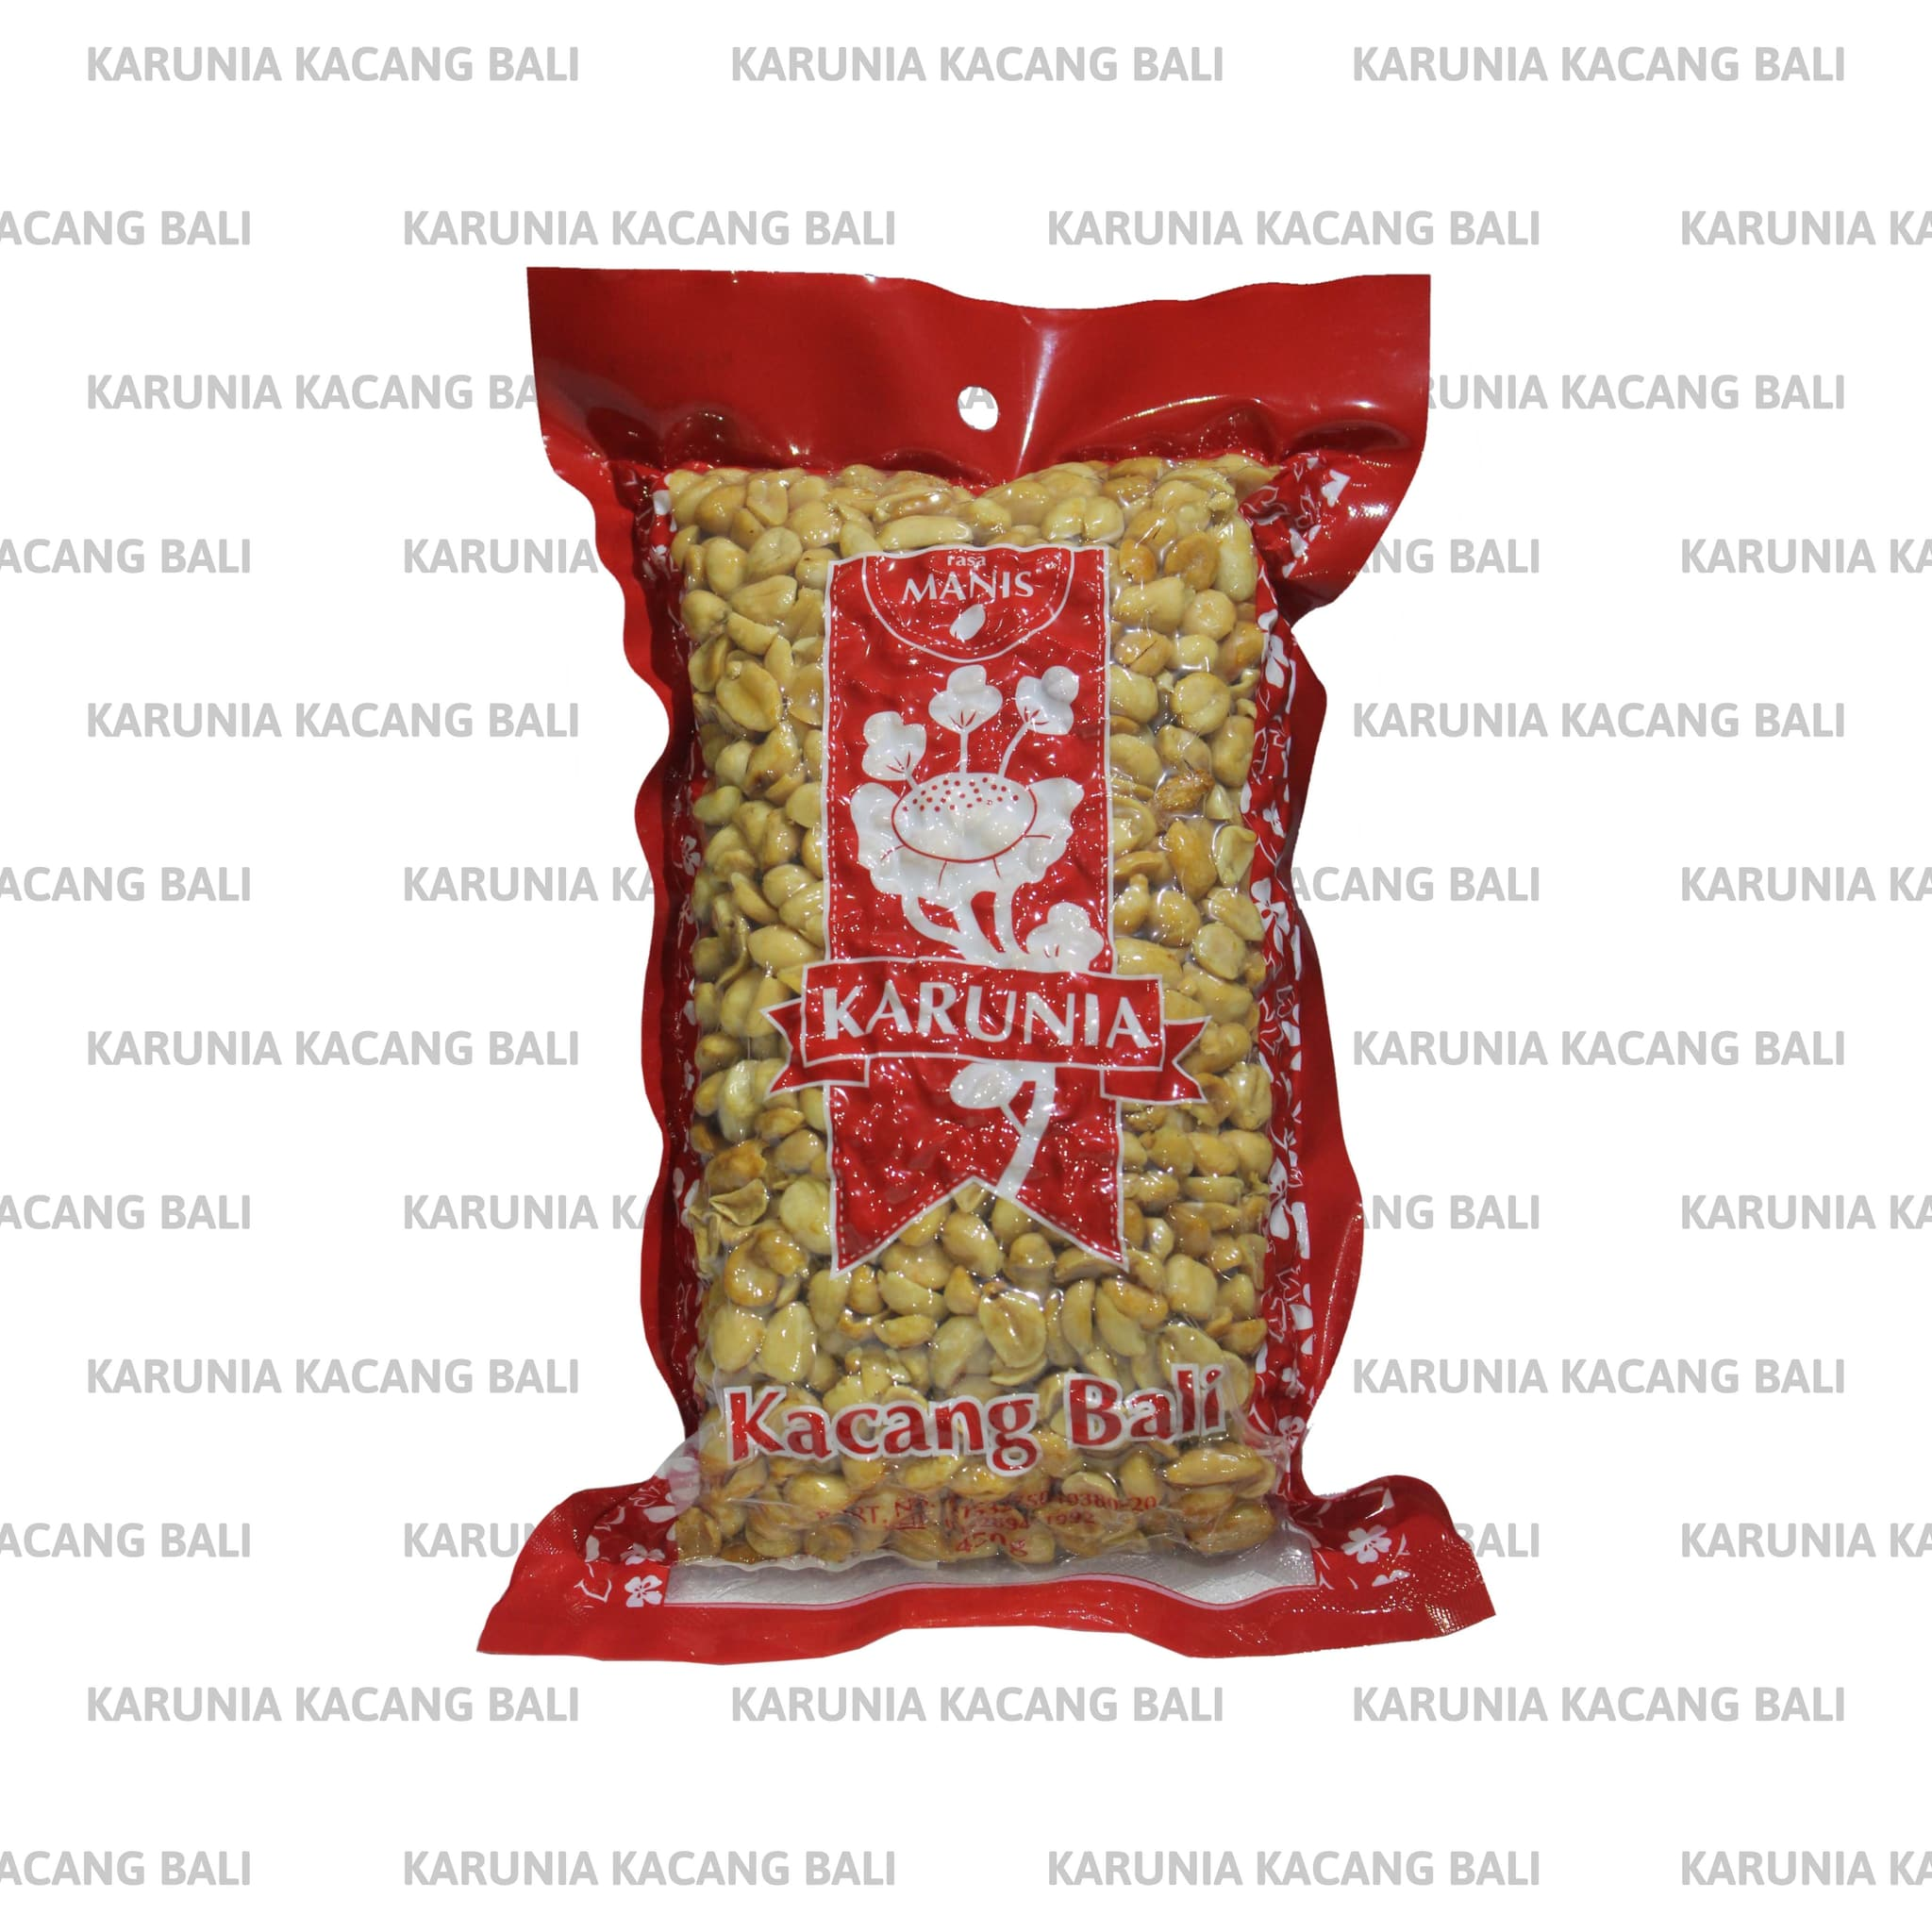 ... Karunia Kacang Bali Manis 450gr Harga Diskon - Blanja.com ...